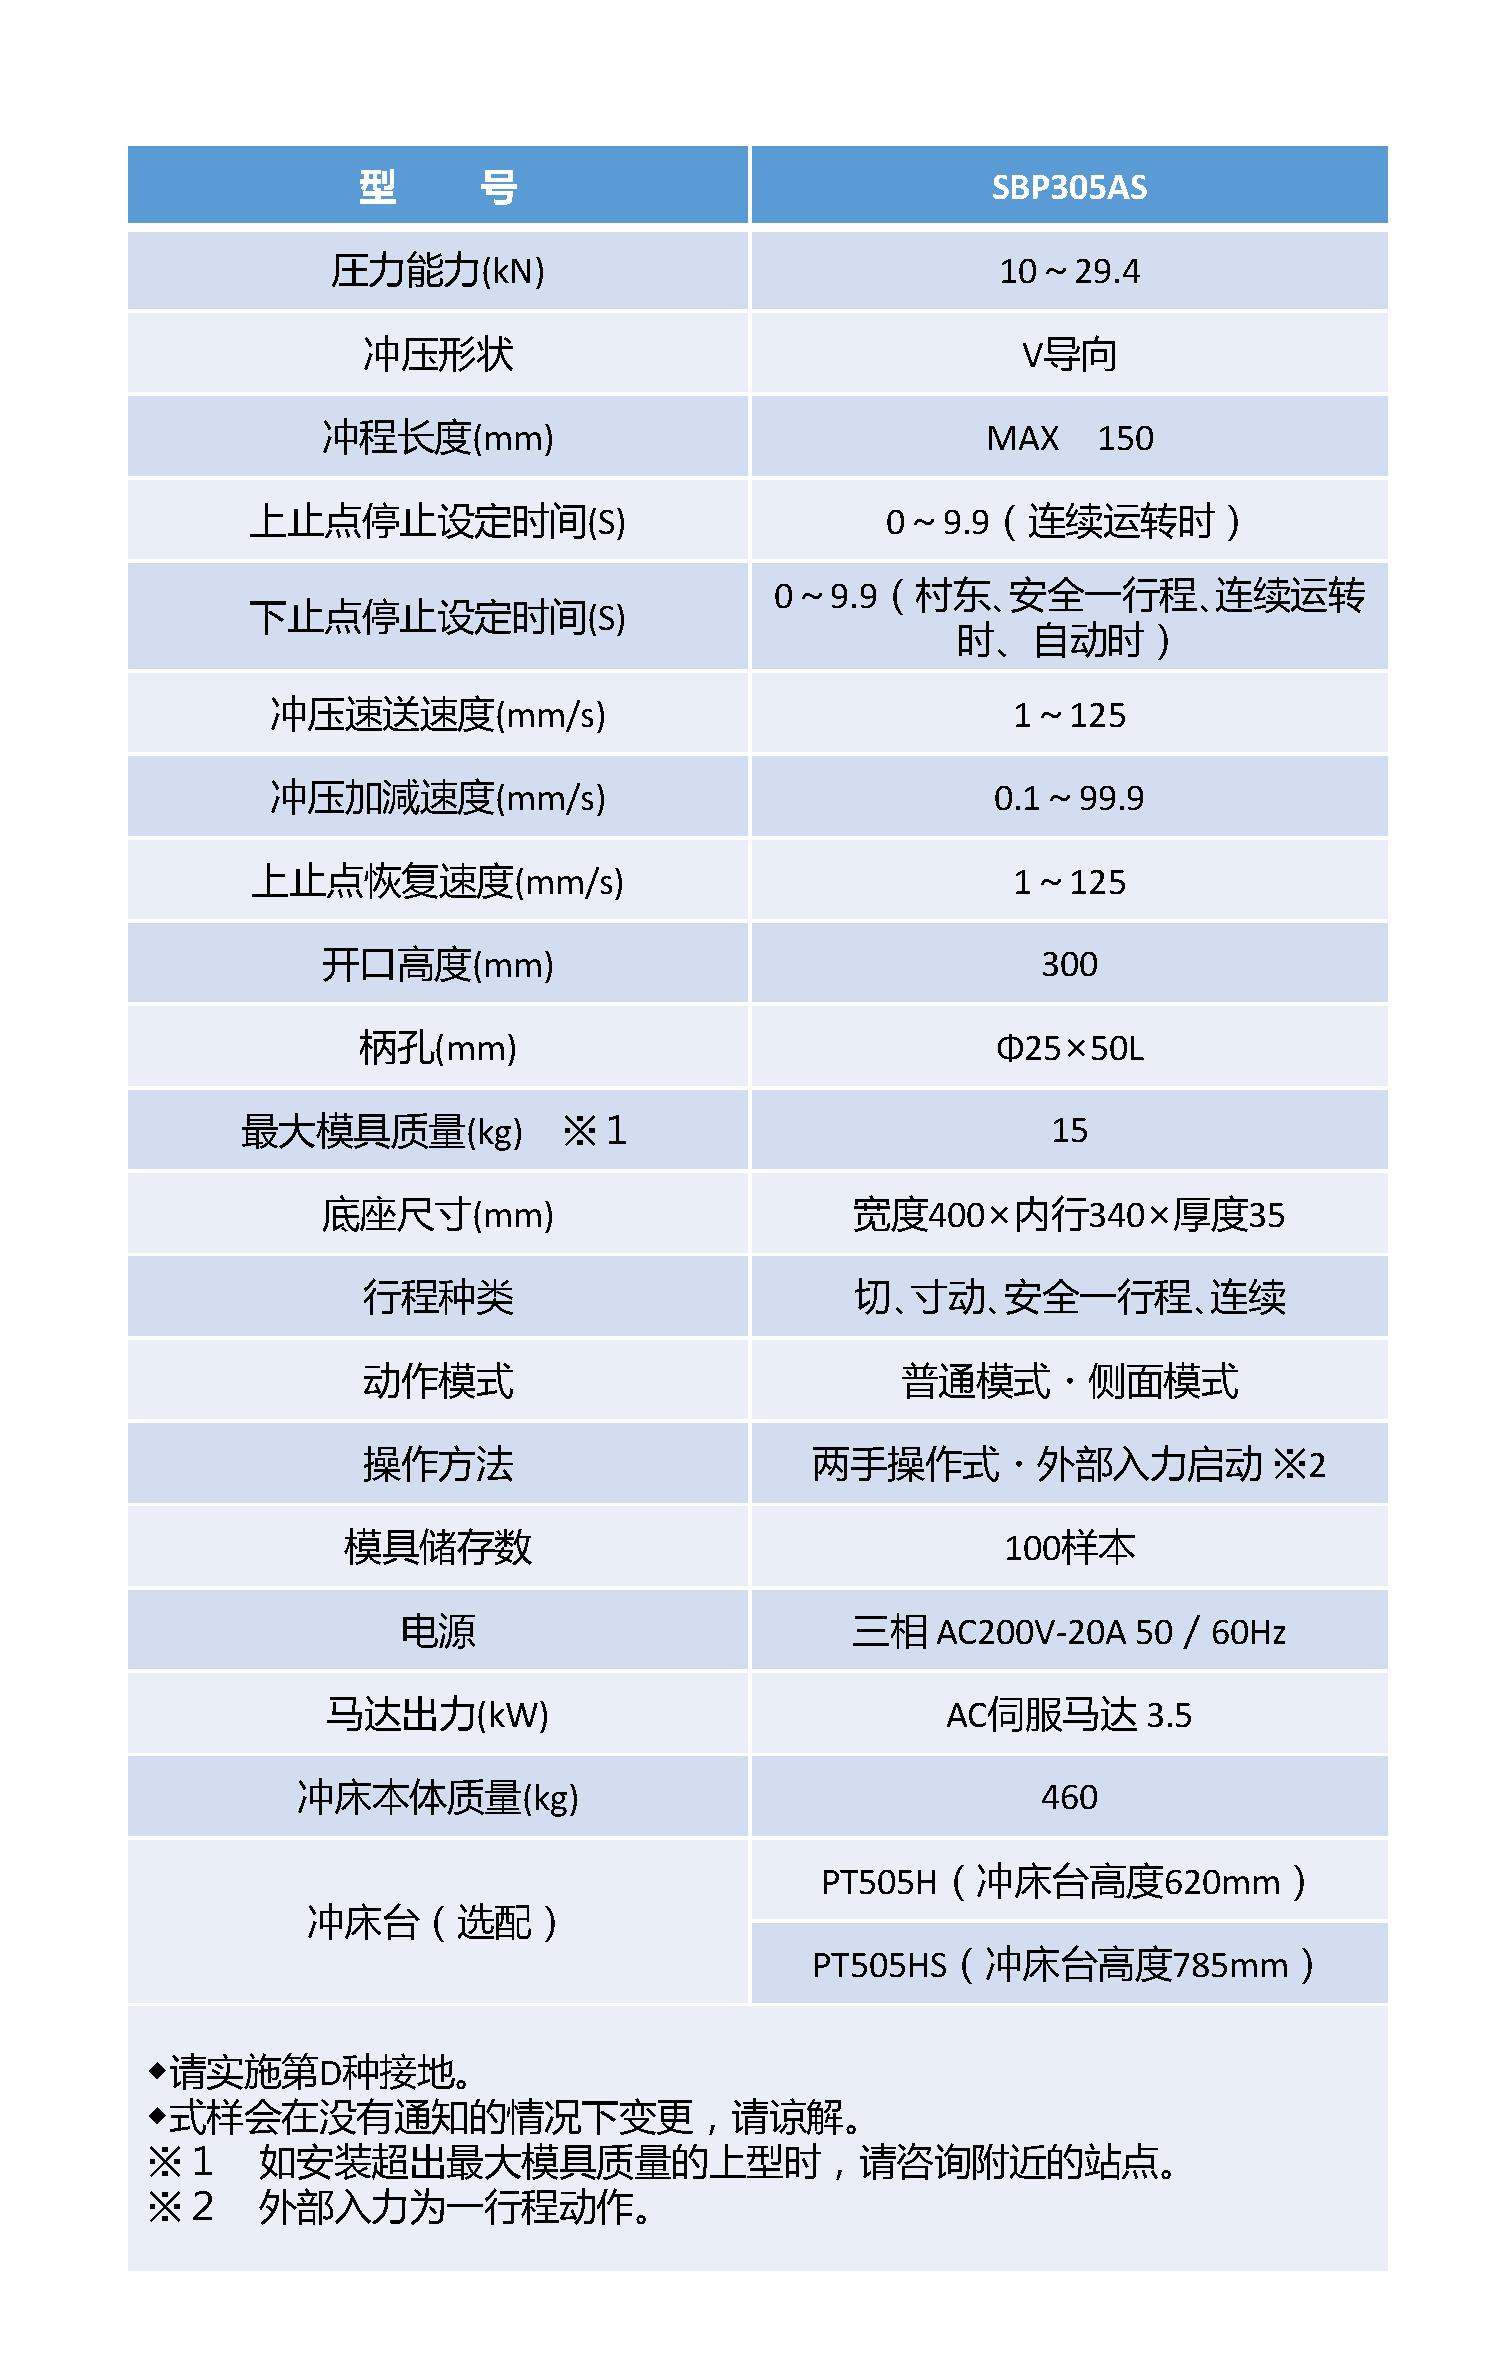 SBP305AS_仕様_D - 中文.png